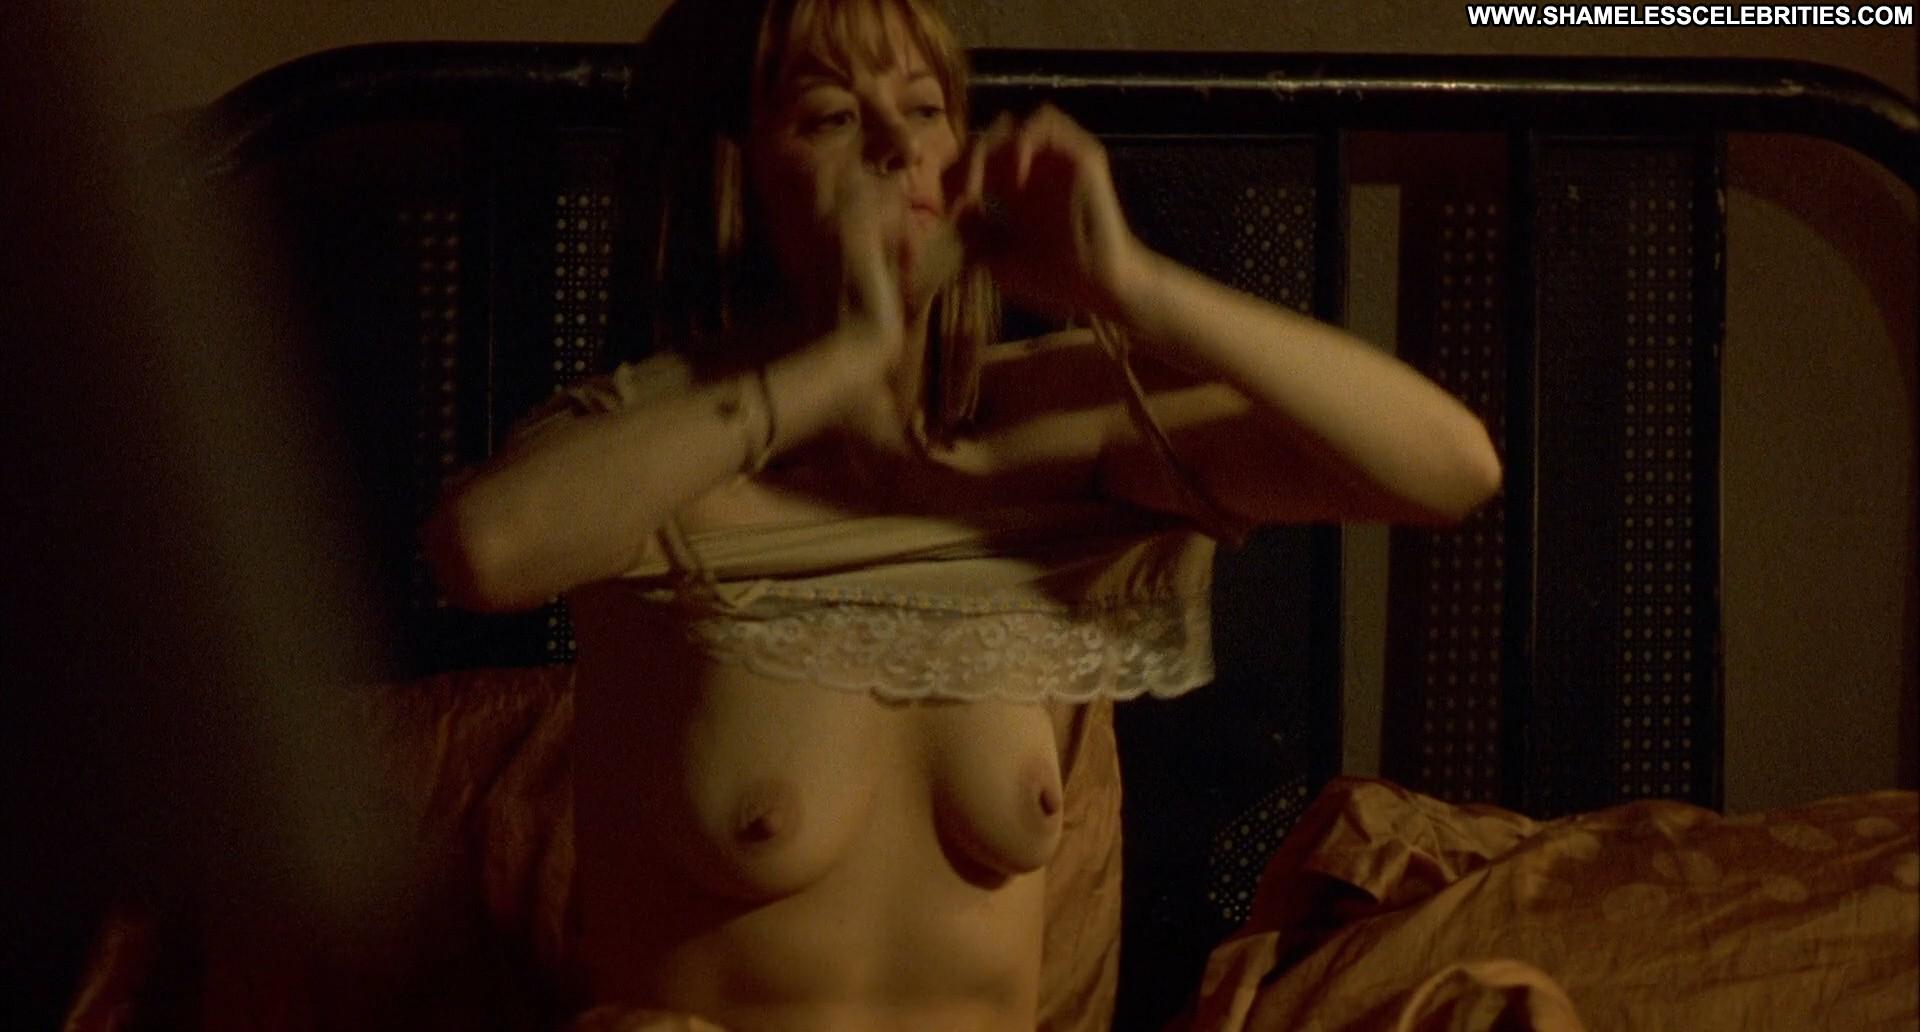 Meg Ryan In The Cut Hot Posing Hot Full Frontal Celebrity Topless Sex